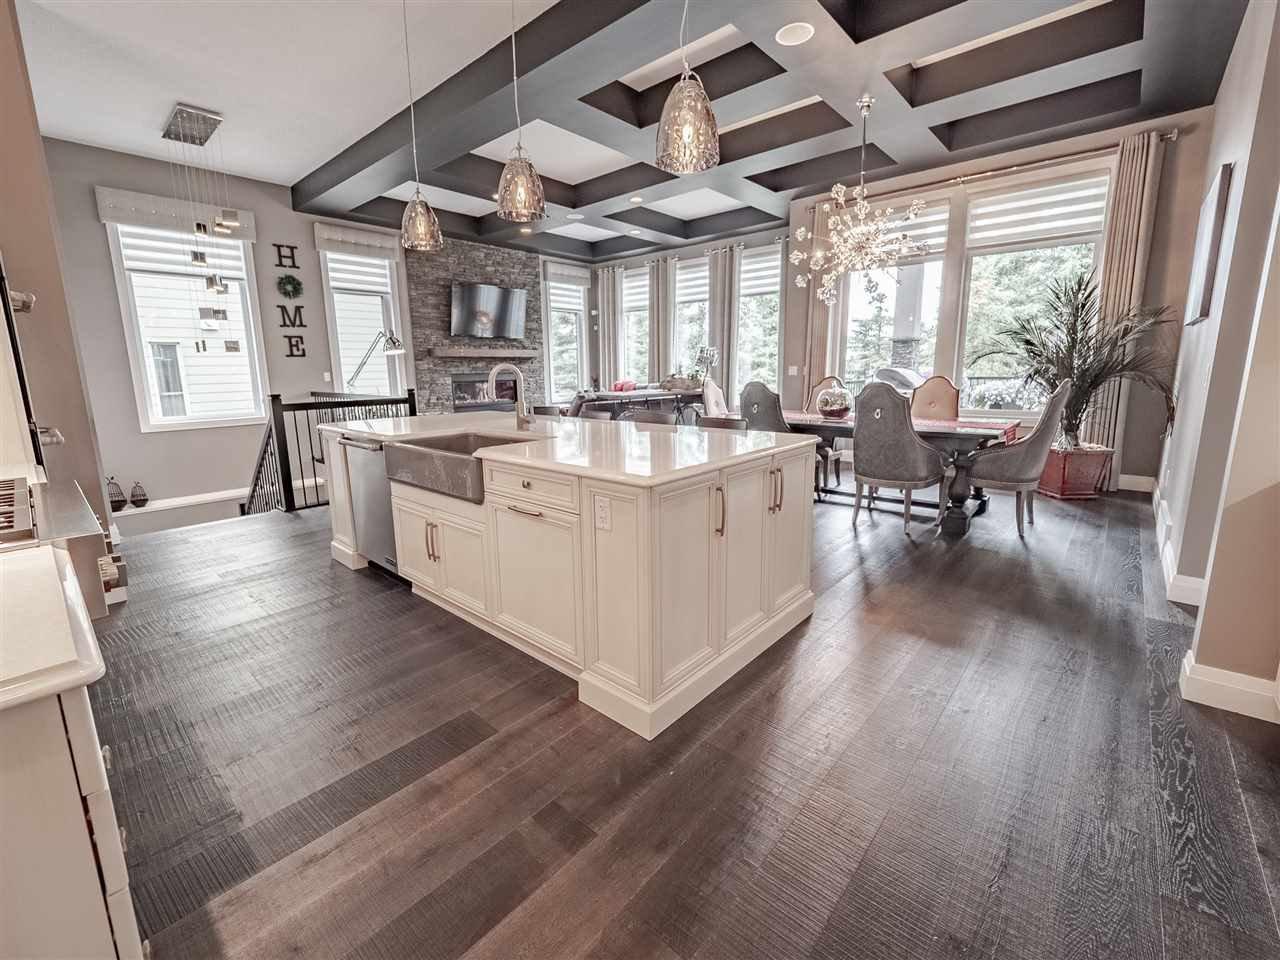 Photo 14: Photos: 58 Kenton Woods Lane NW: Spruce Grove House for sale : MLS®# E4166439